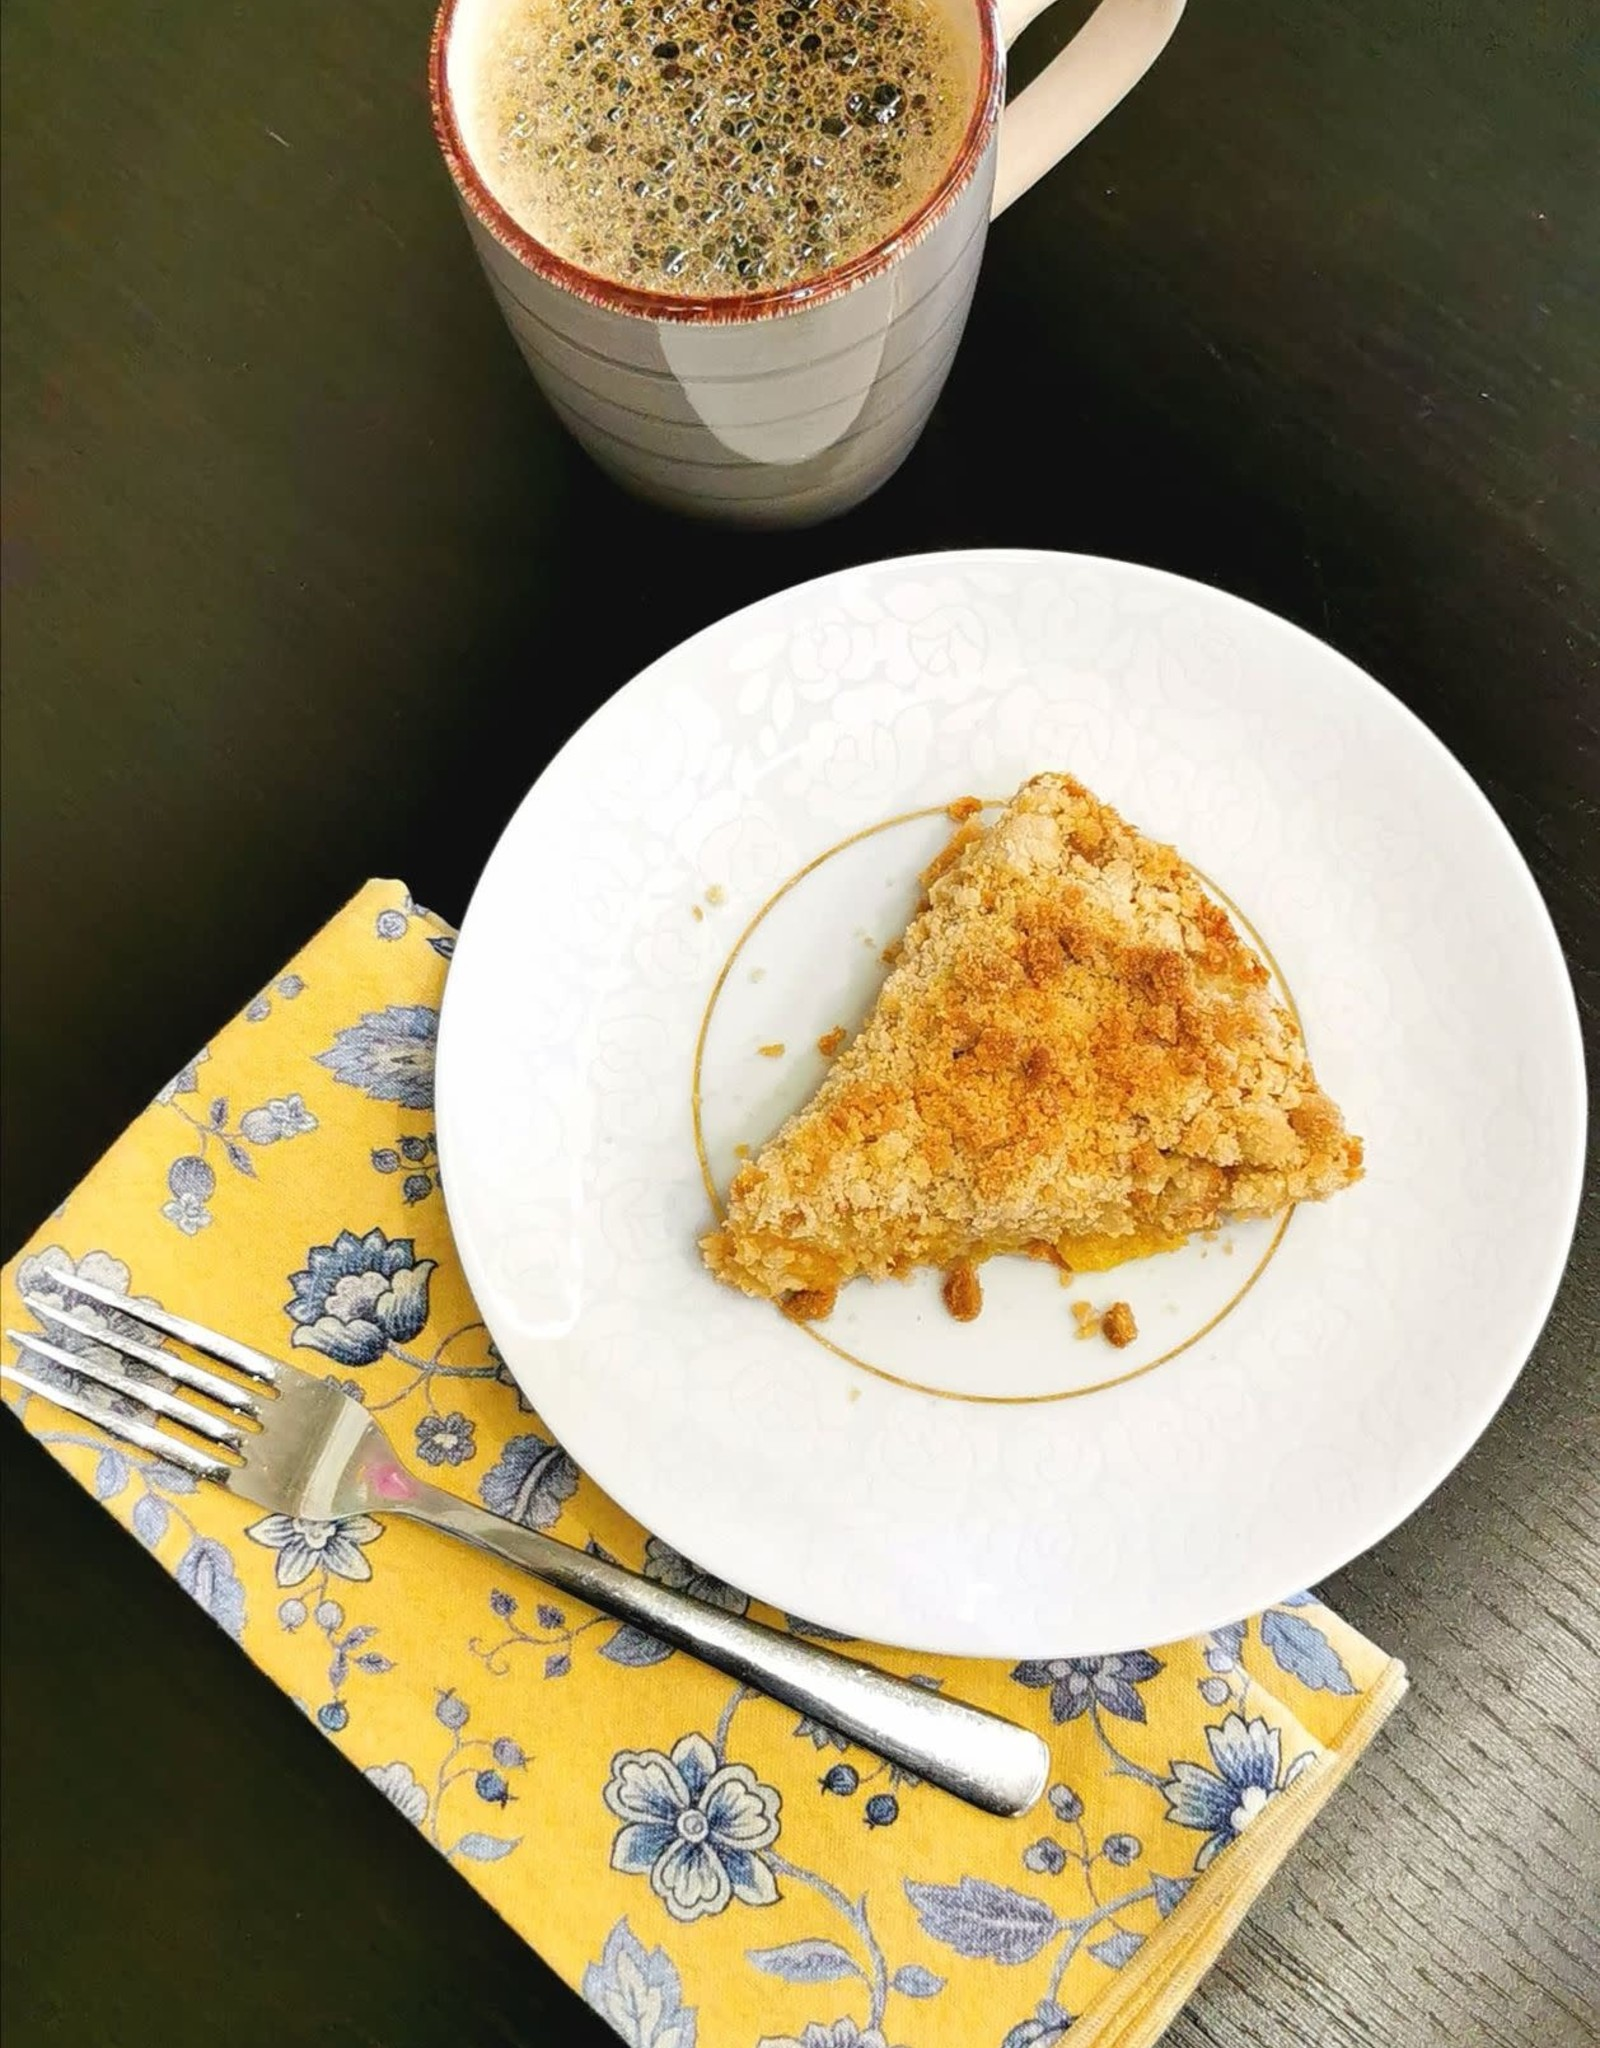 Cafe Artiste CATO:  Pie slice